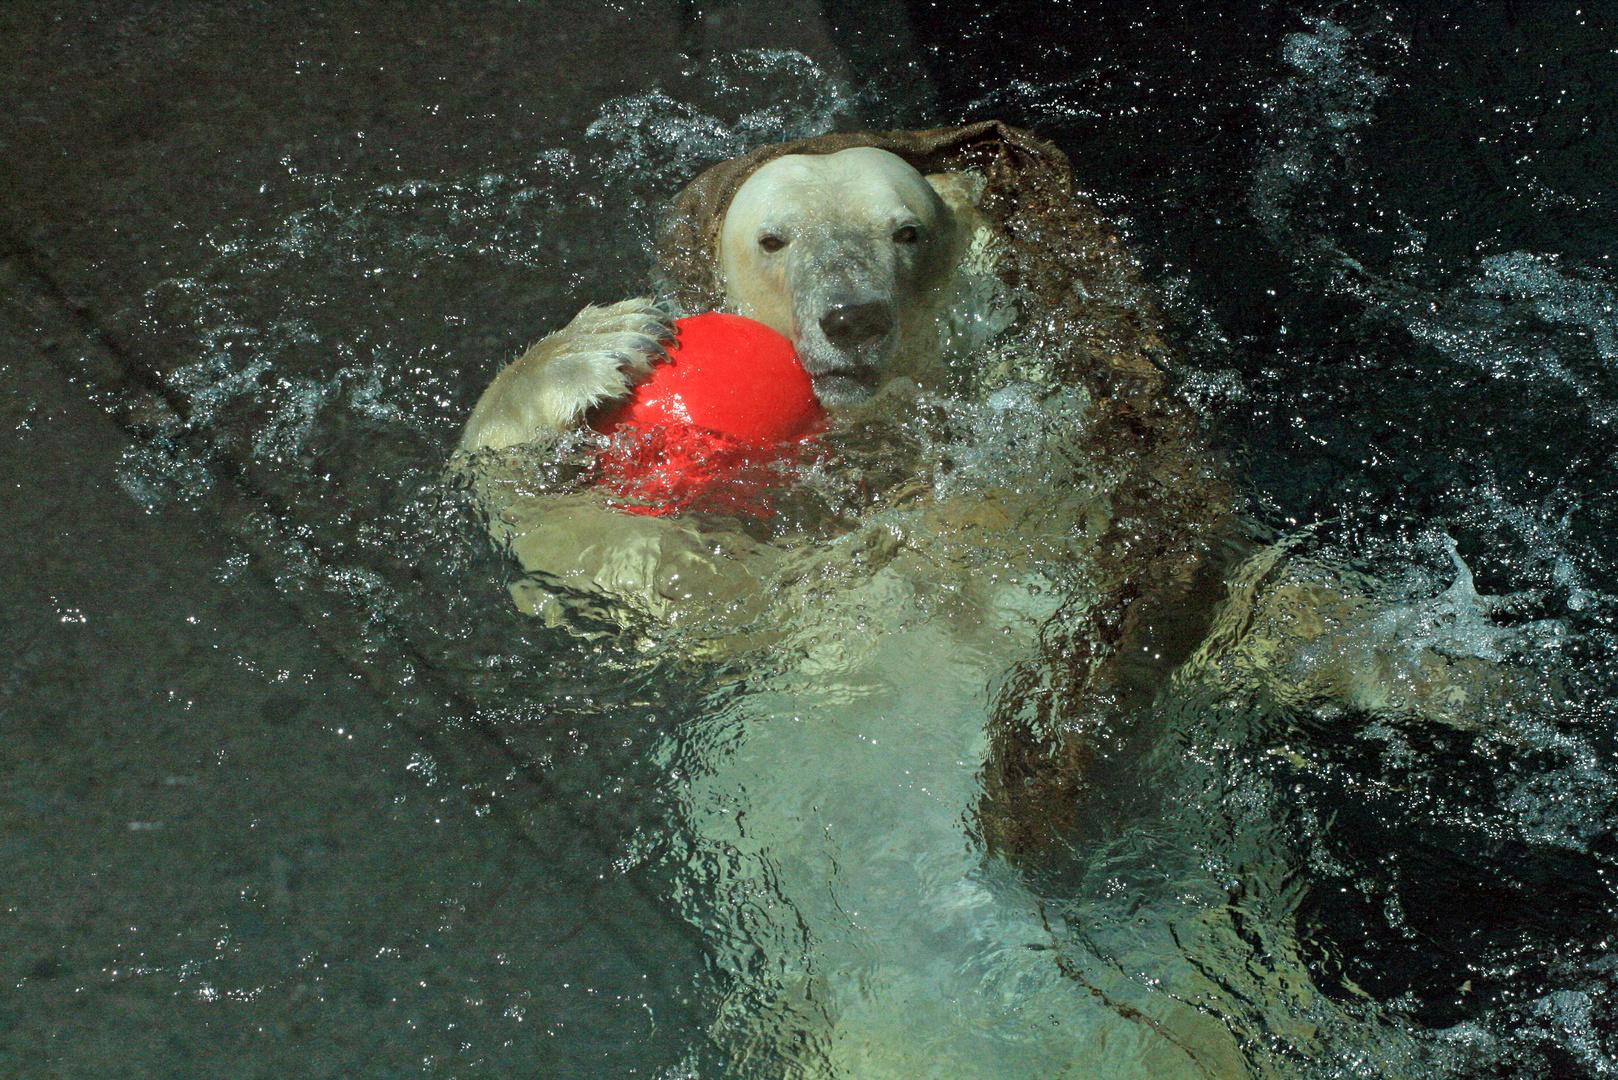 Eisbärdame aus dem Central Park Zoo